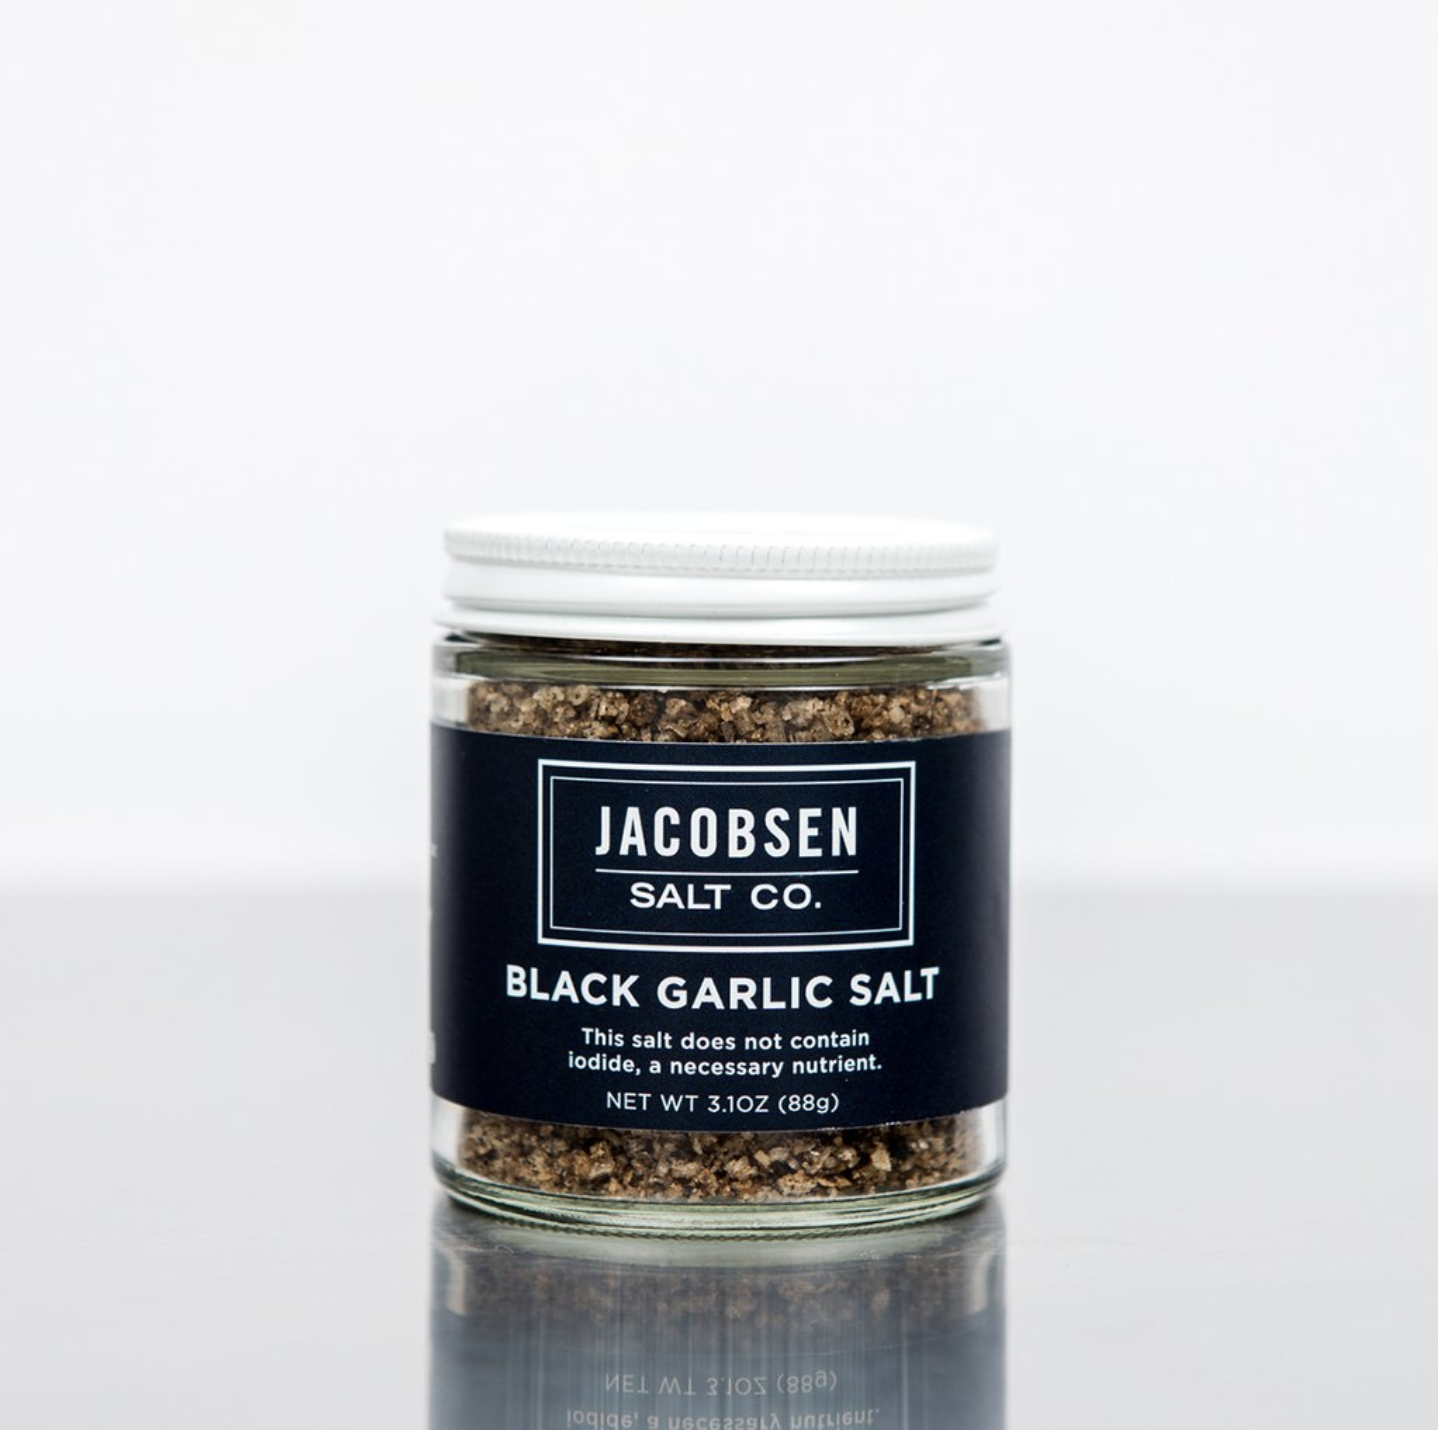 Jacobsen Salt Co. Black Garlic Salt